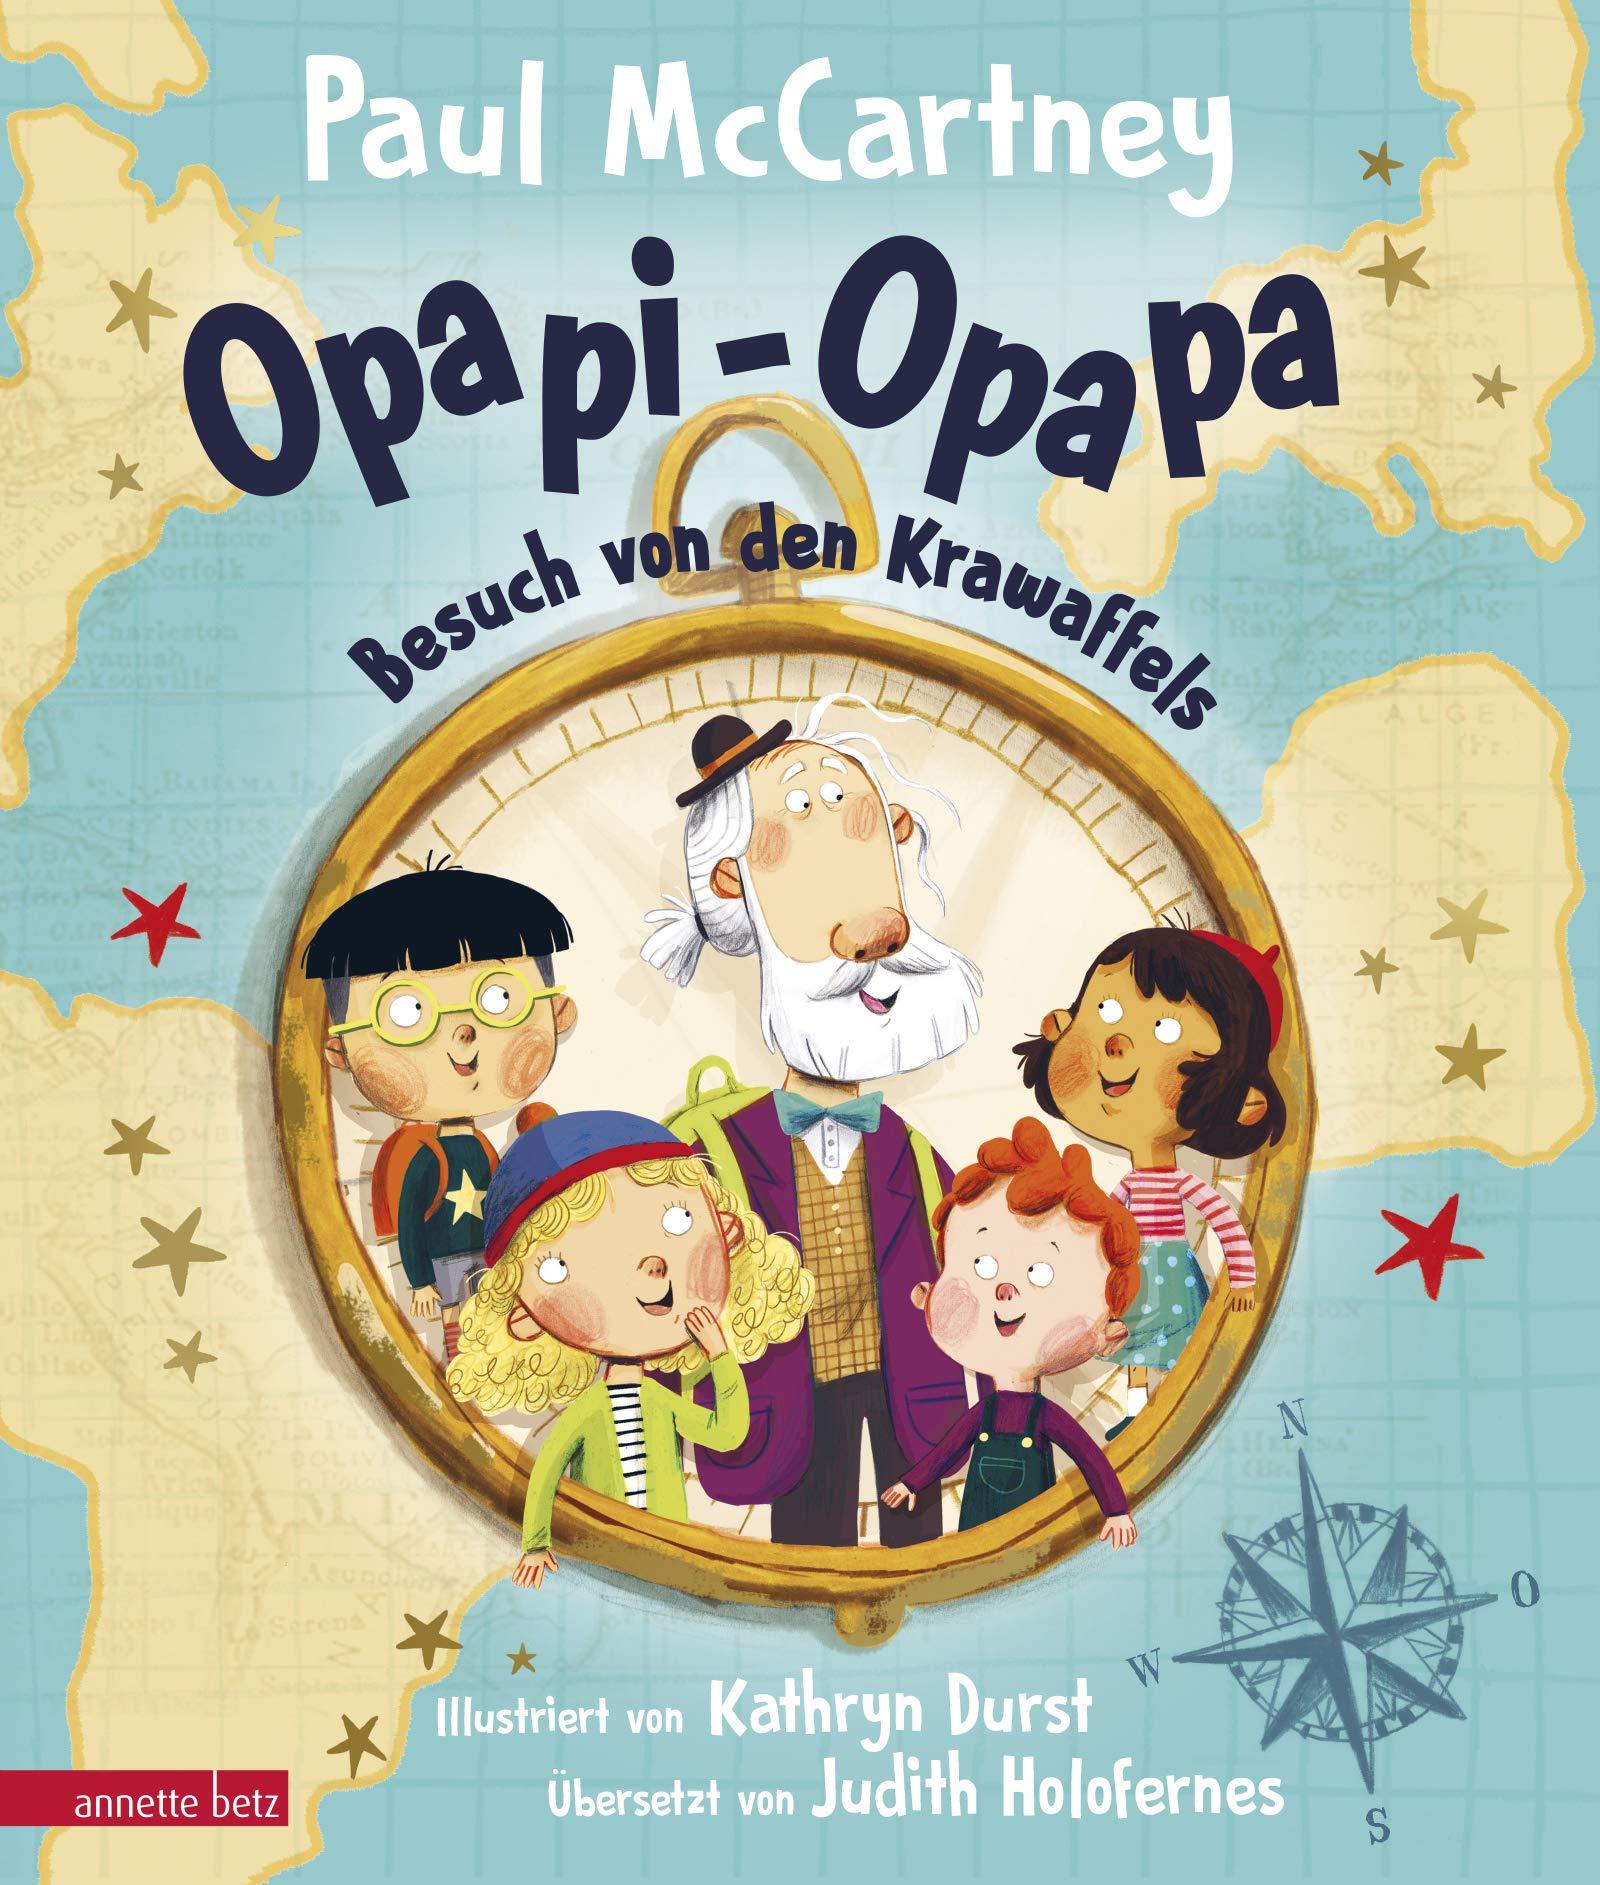 Opapi-Opapa – Besuch von den Krawaffels